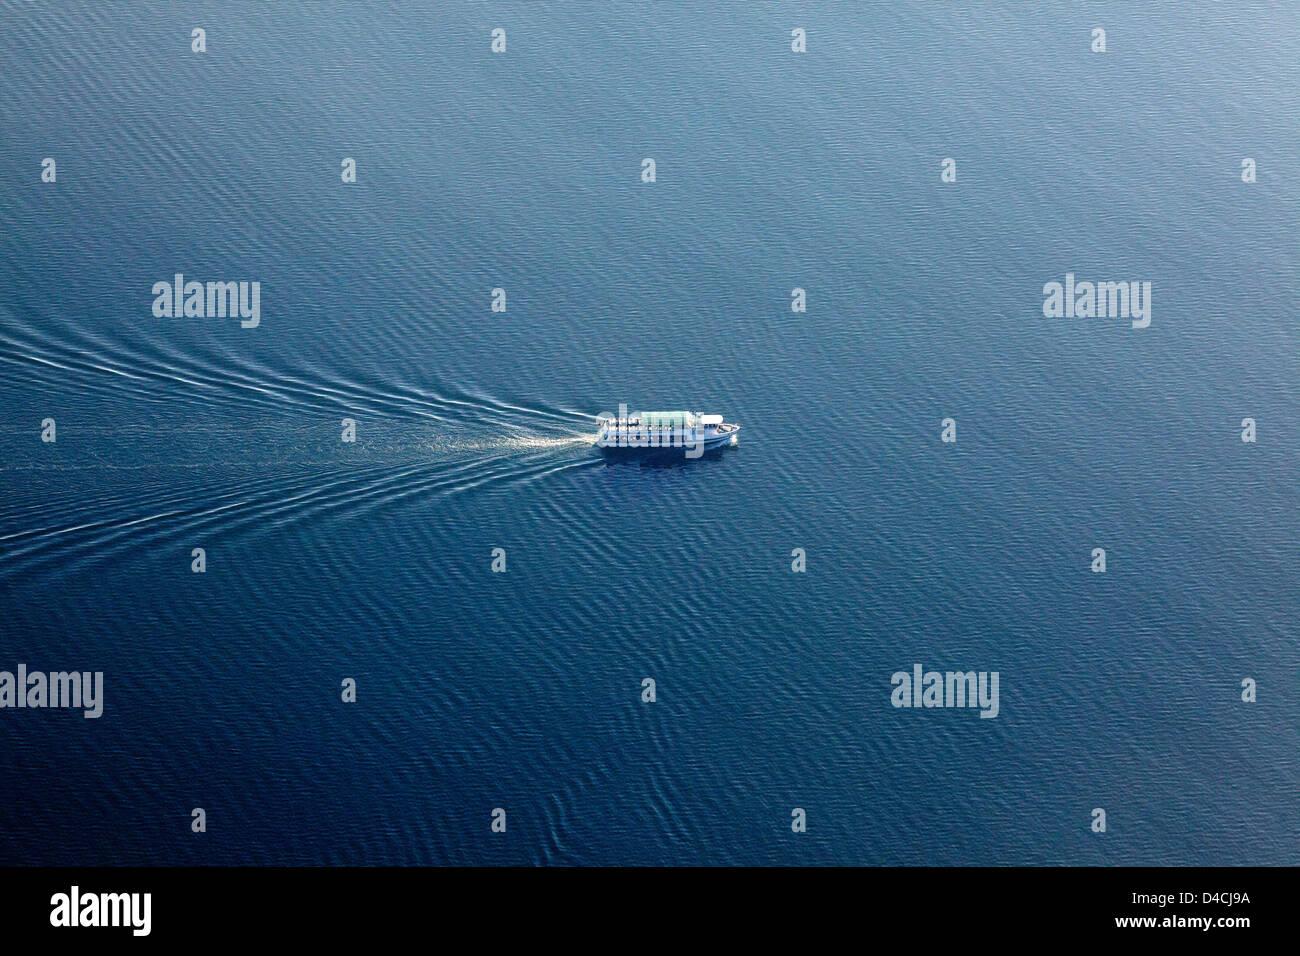 Passenger ship on Bodensee, Konstanz, Baden-Wuerttemberg, Germany, Europe - Stock Image